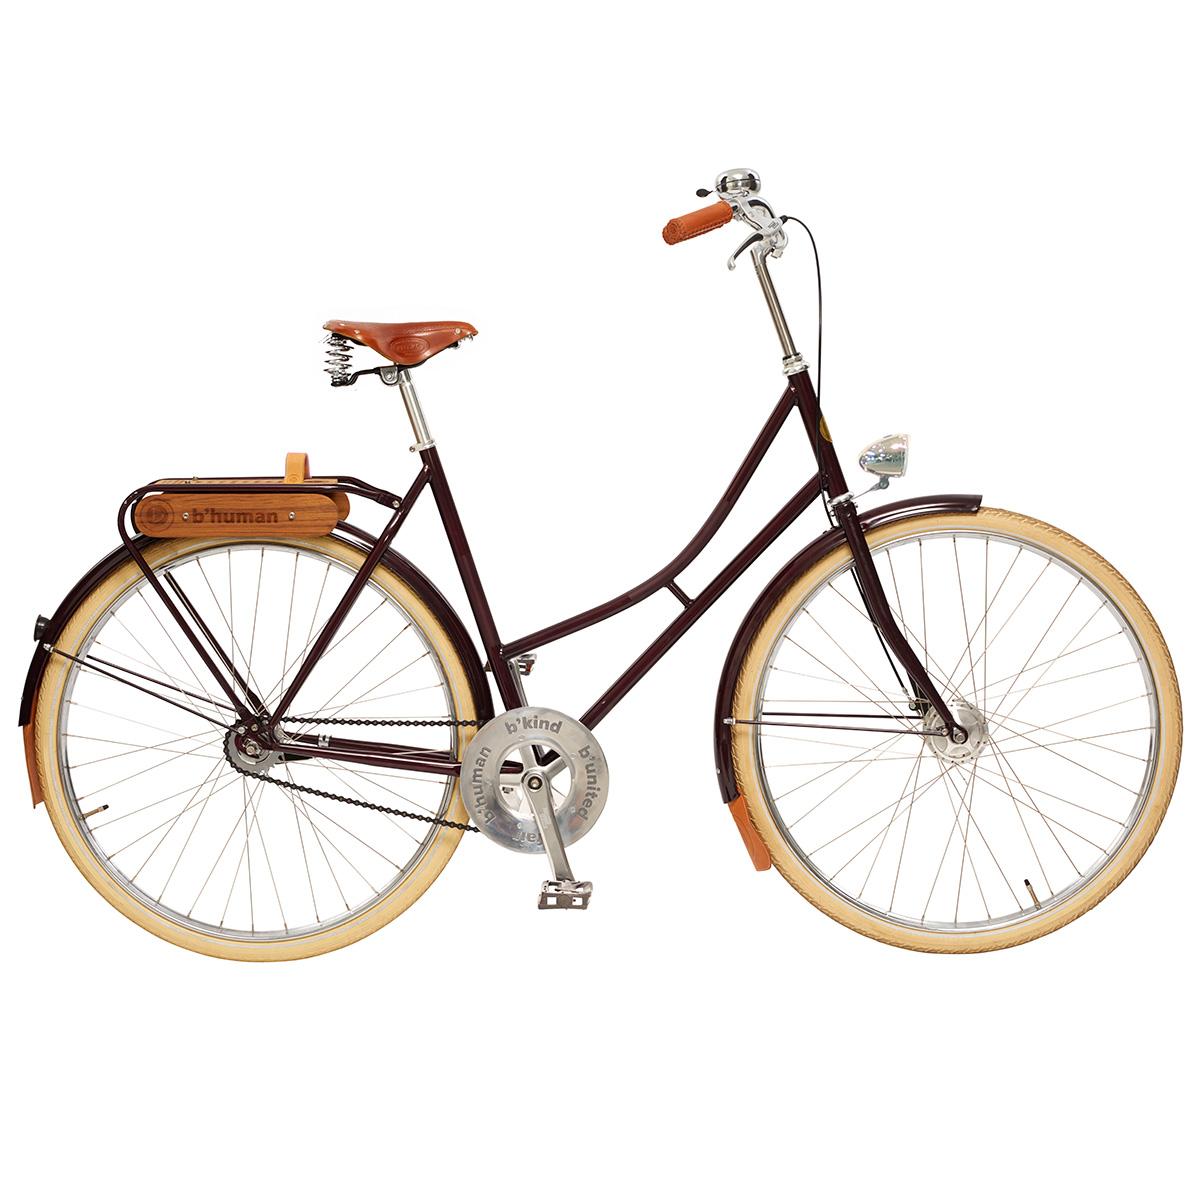 Bfair damecykel med 2 gear - Bordeaux